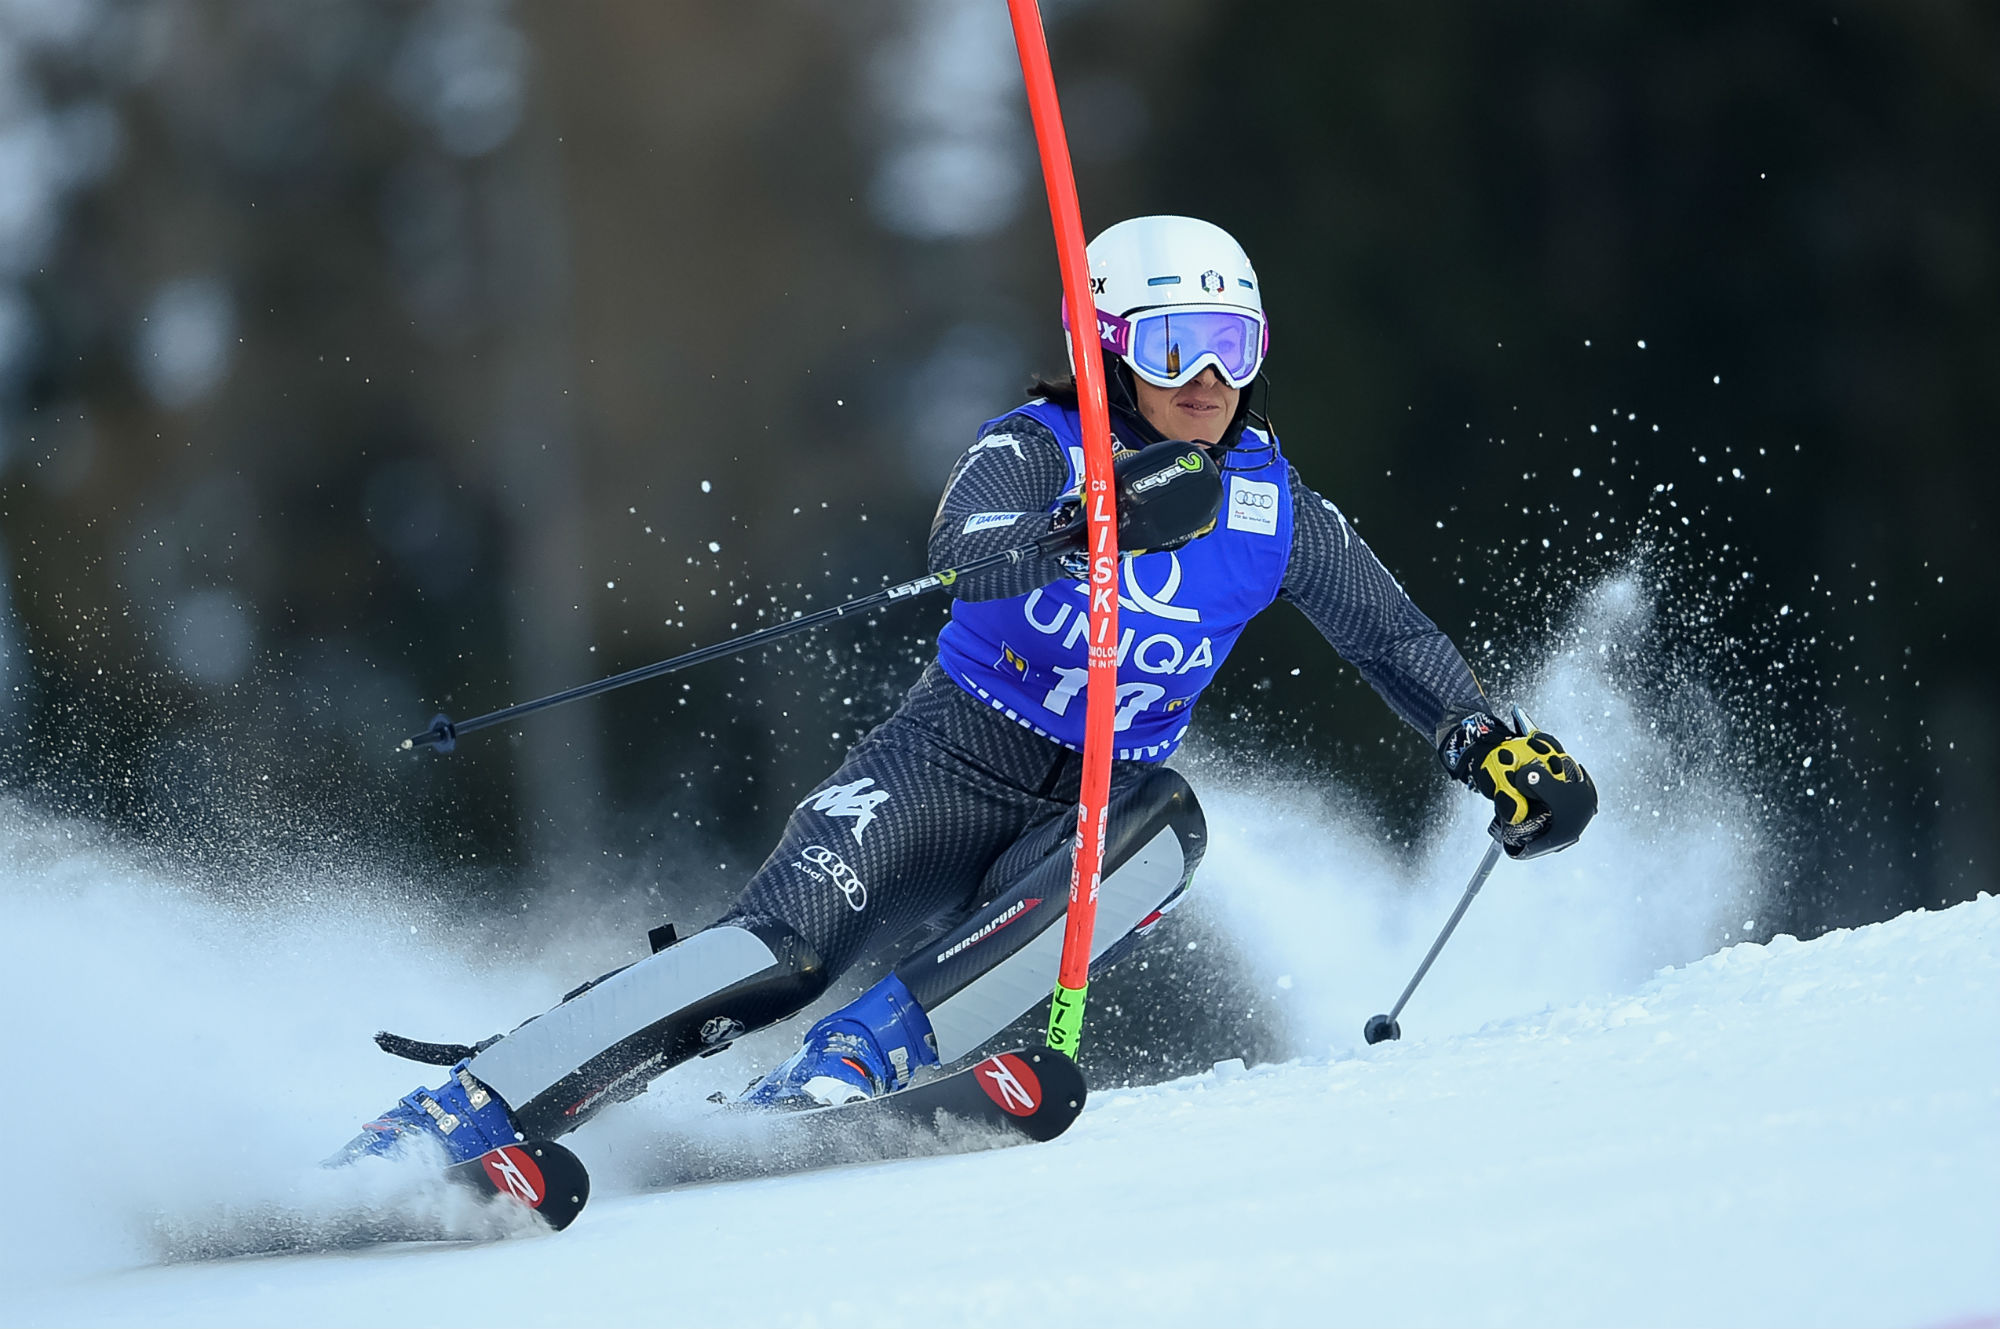 Irene Curtoni in azione in slalom a Semmering (@Zoom agence)